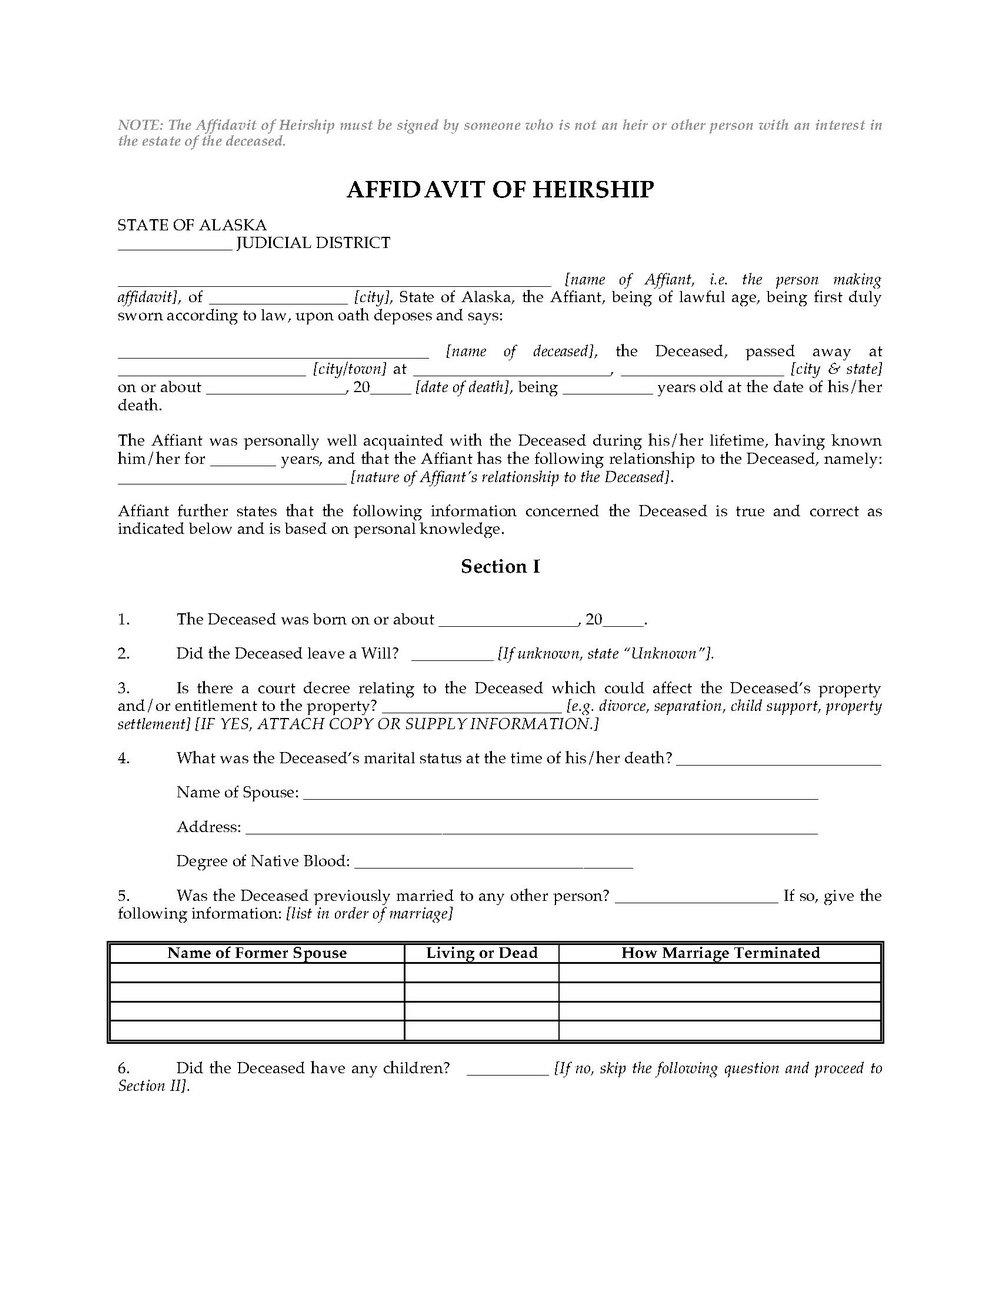 Affidavit Of Heirship Form Louisiana